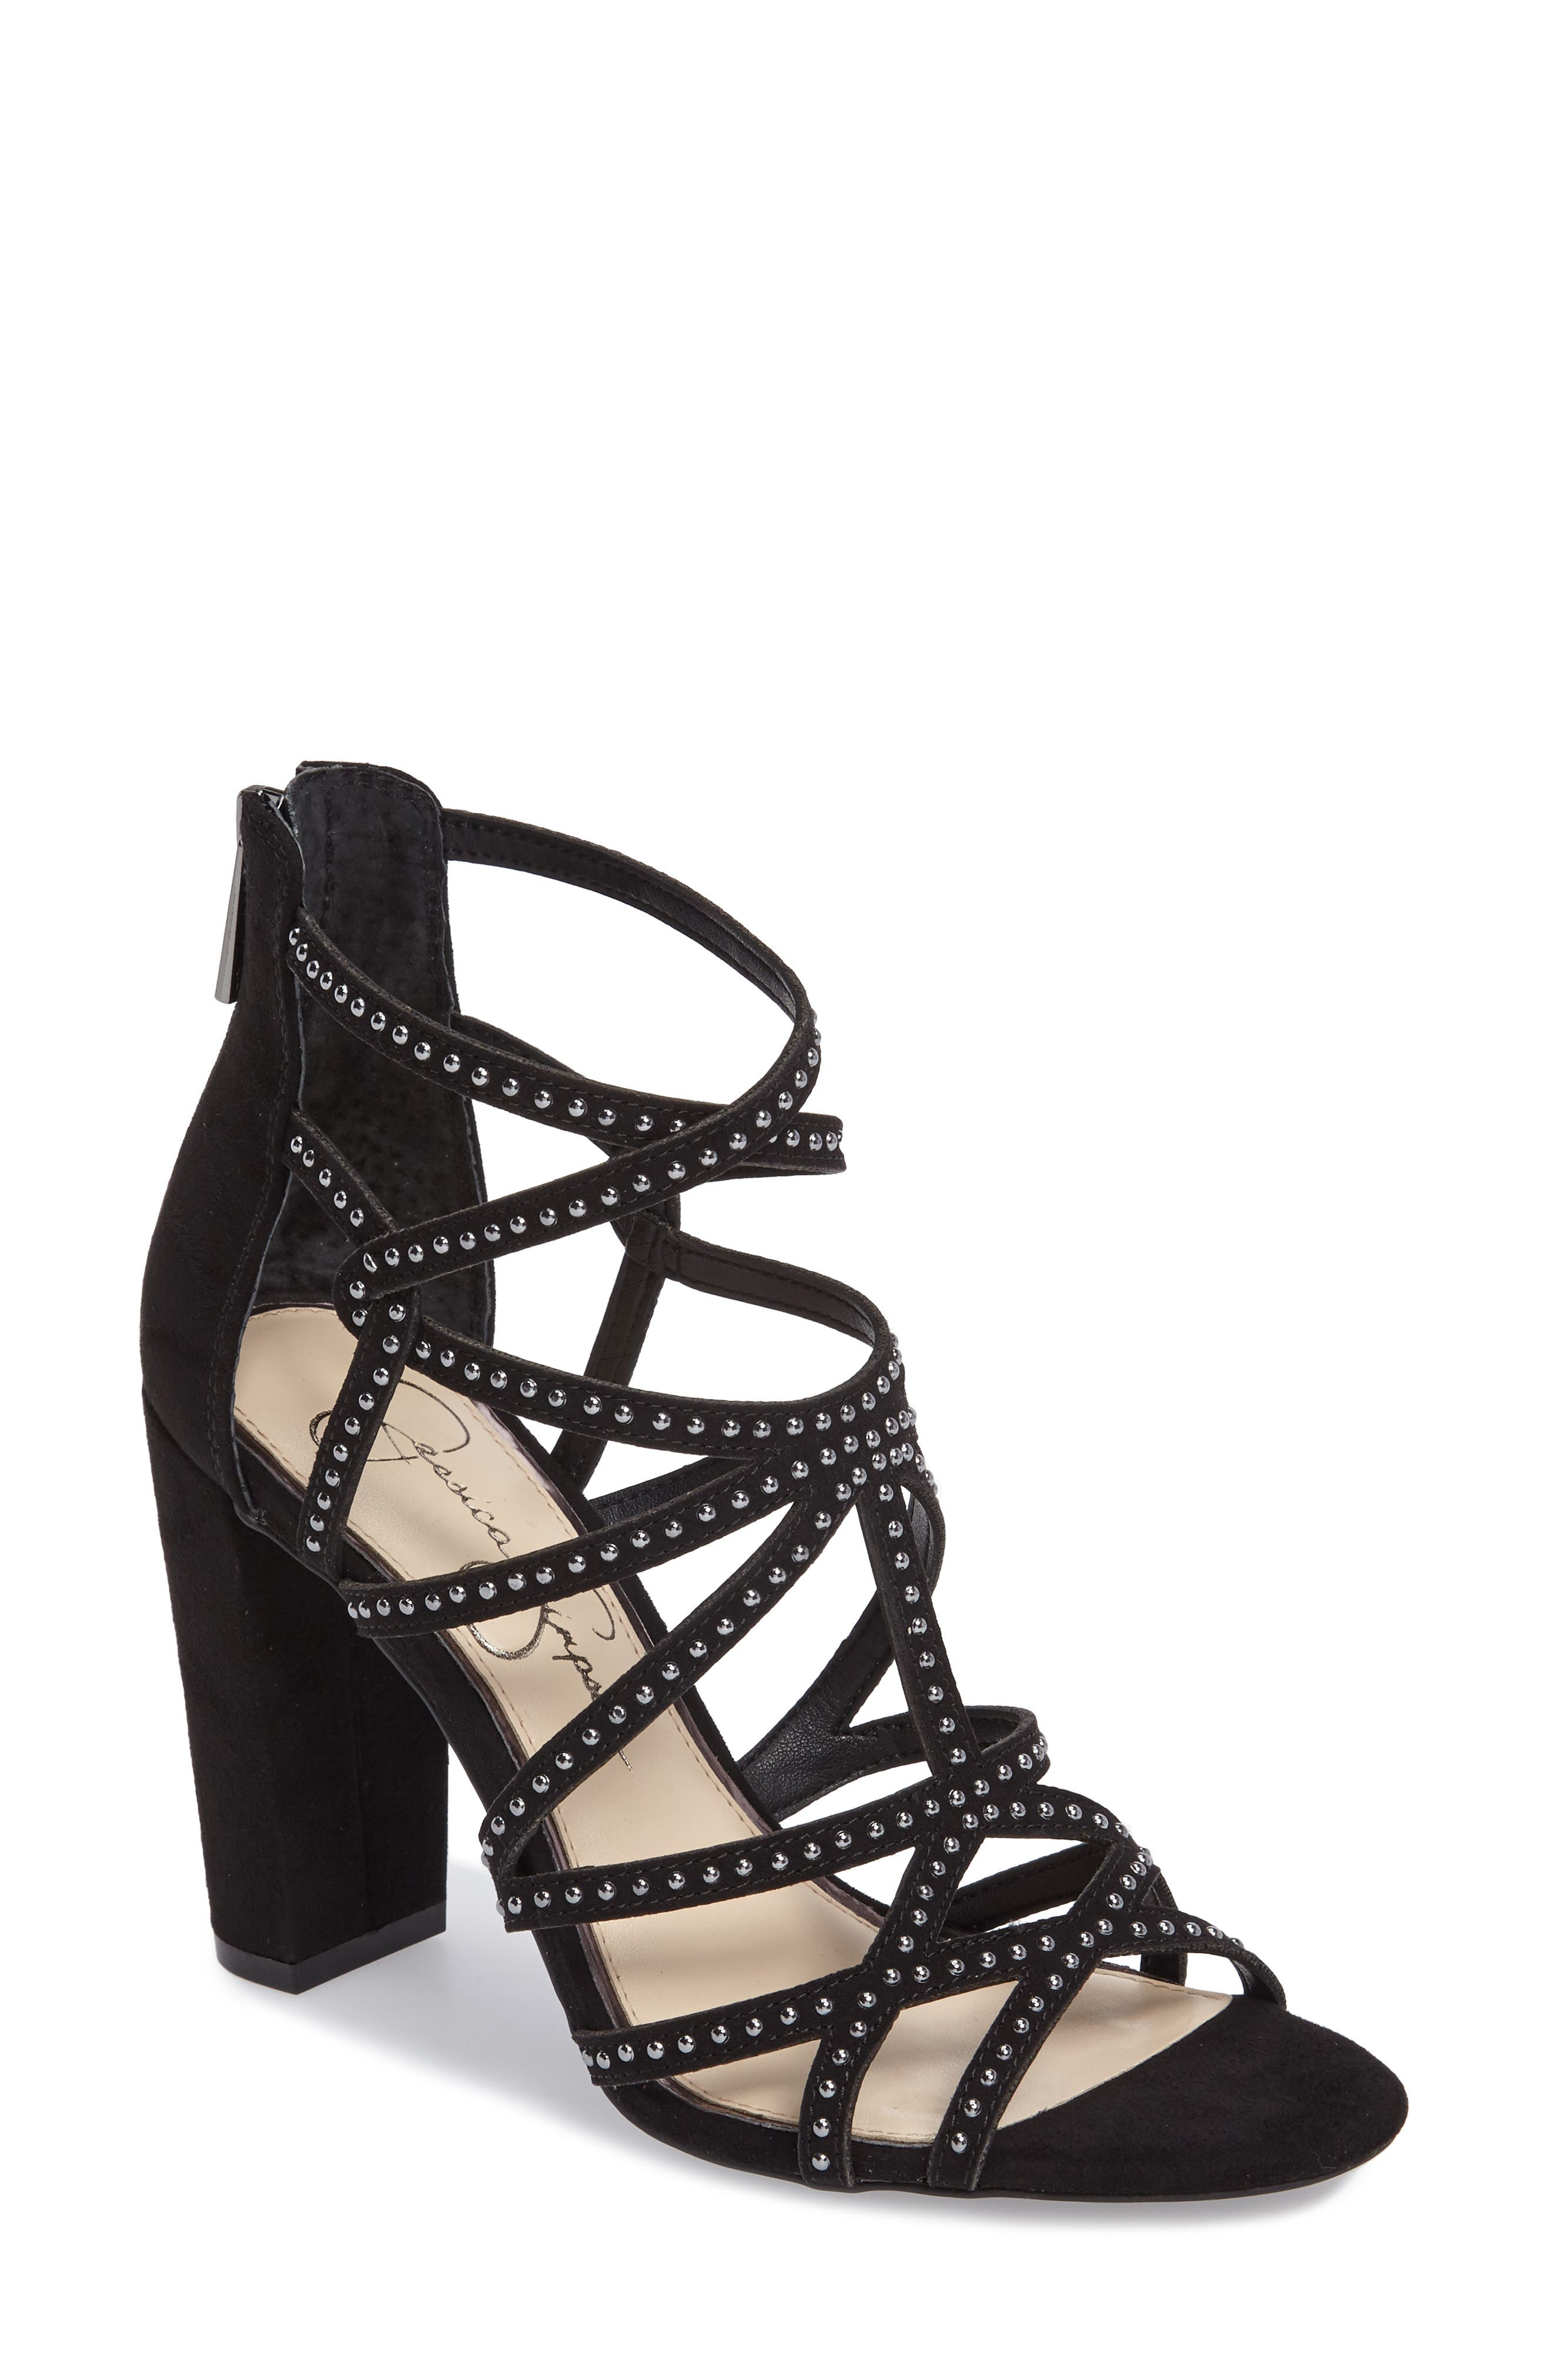 Emmi Block Heel Sandal,                             Main thumbnail 1, color,